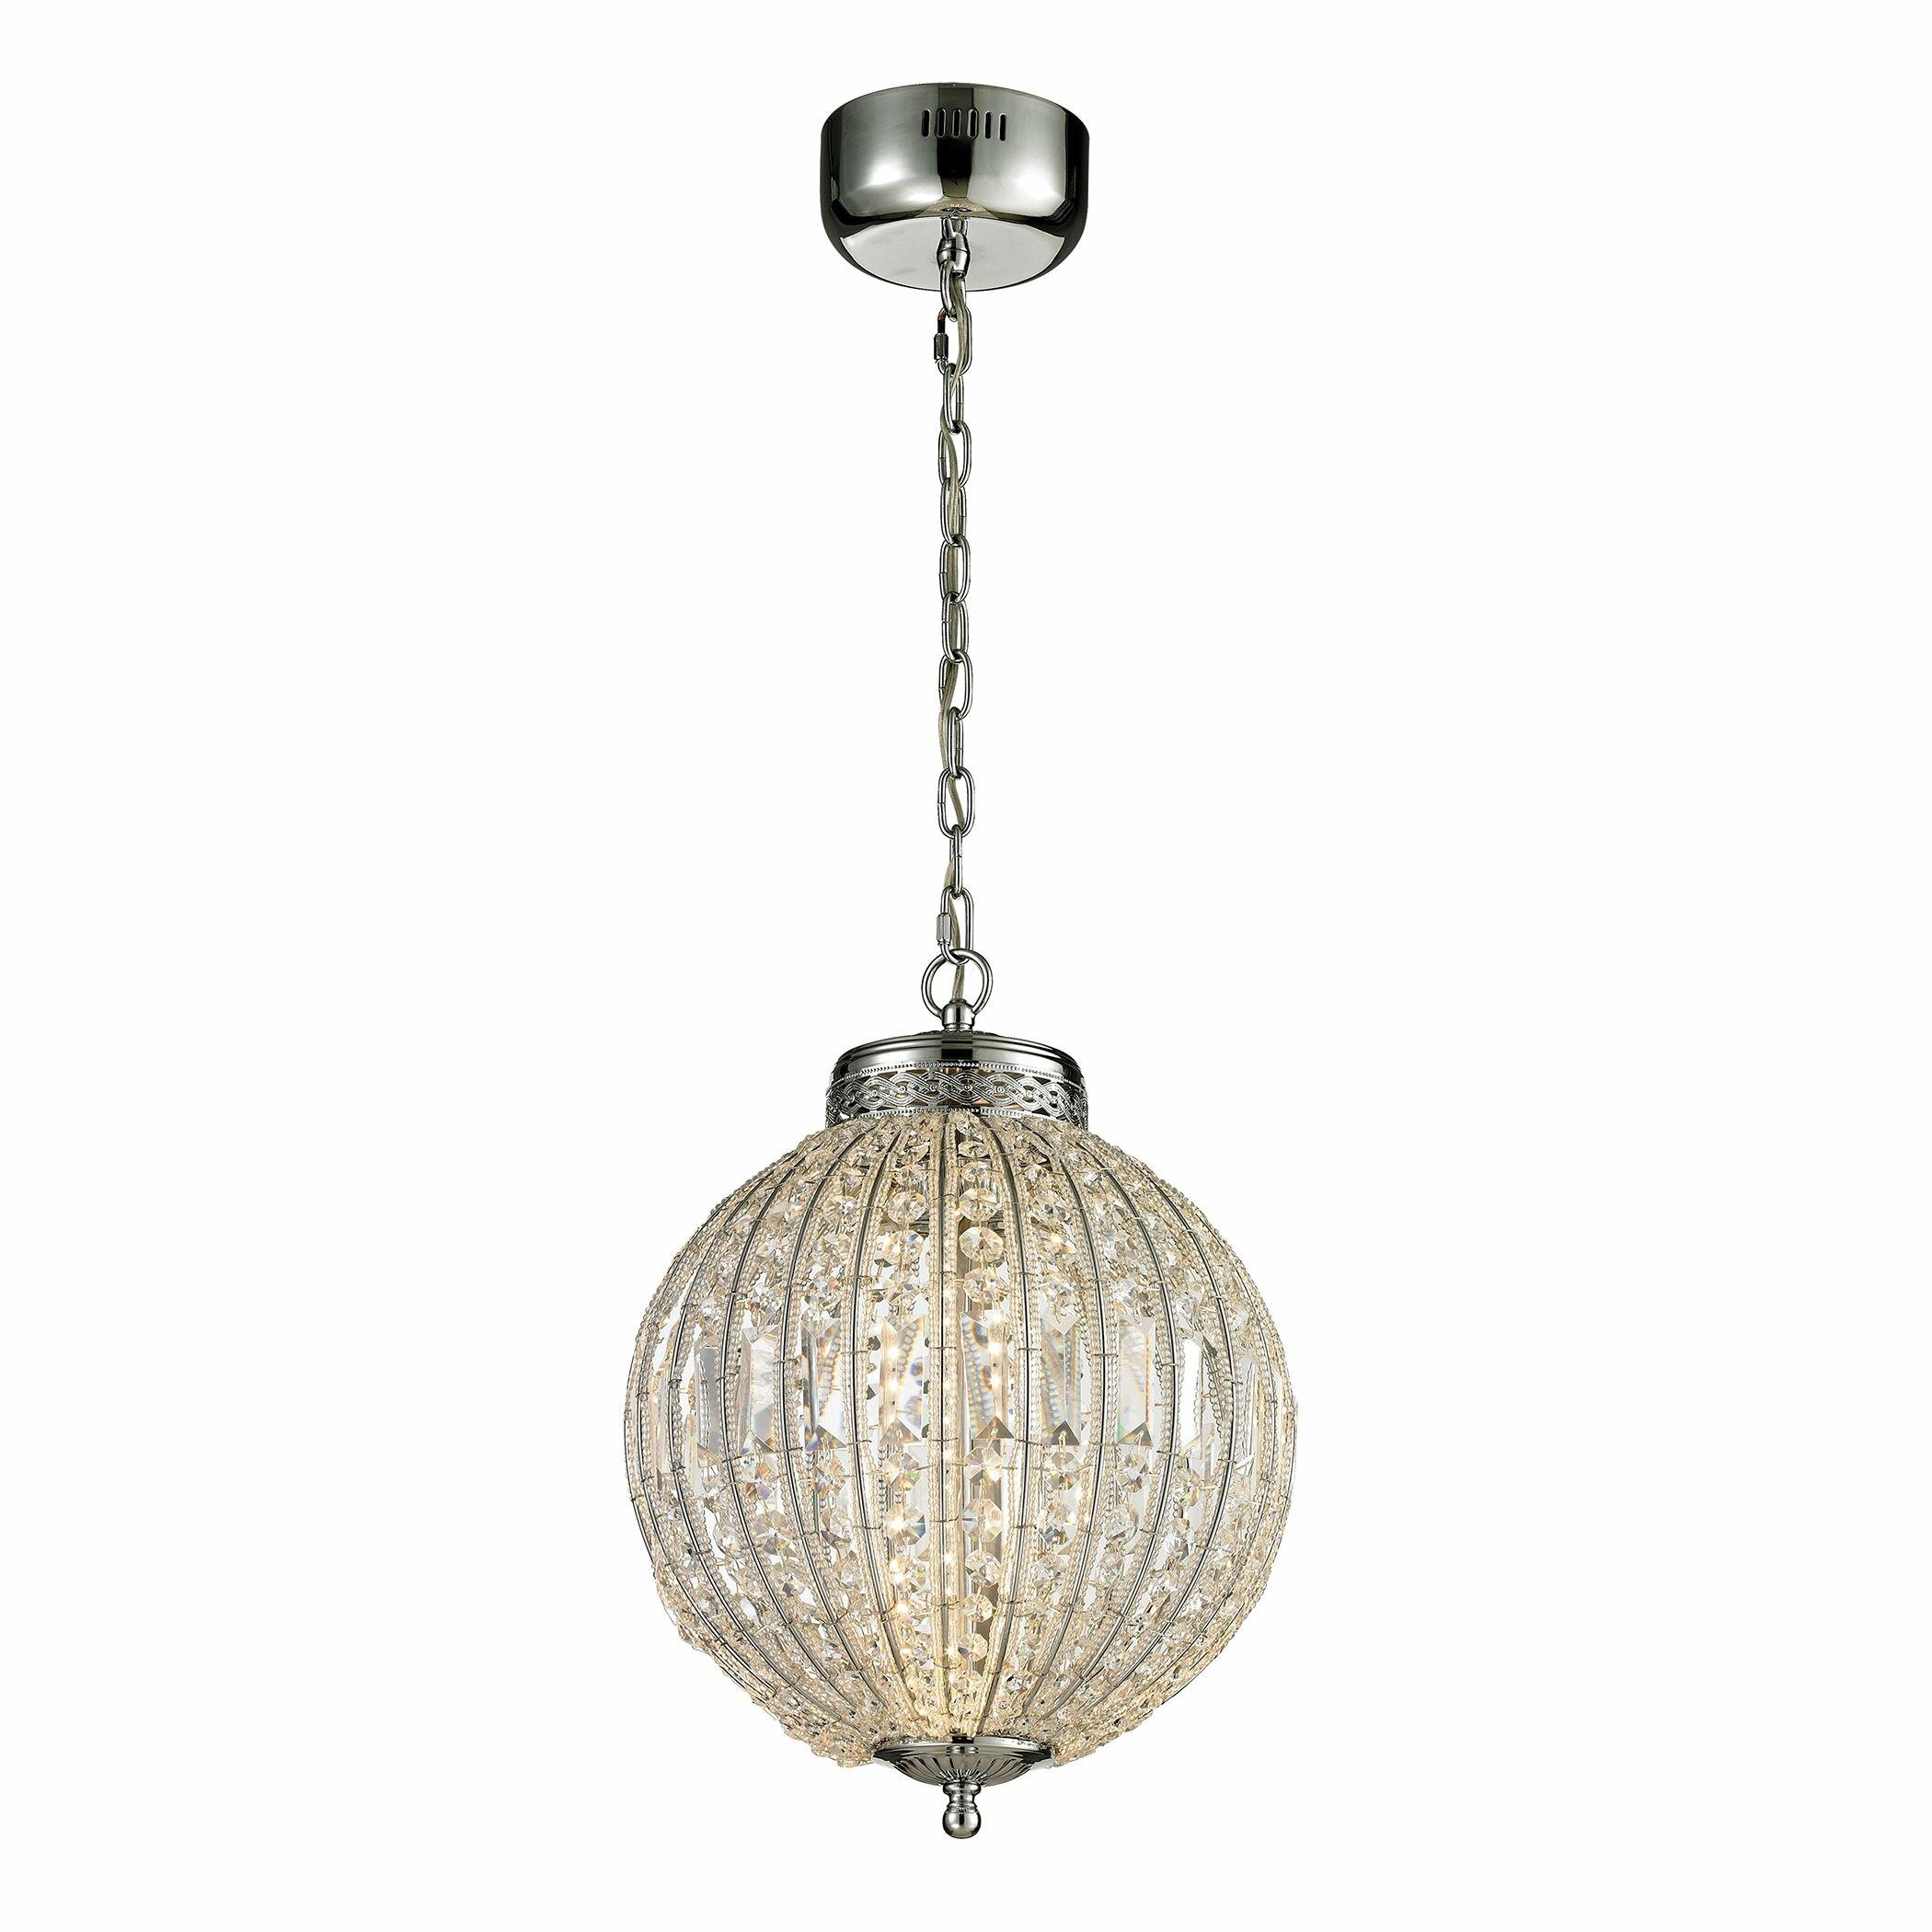 Elk lighting crystal pendant : Elk lighting crystal led integrated bulb globe pendant